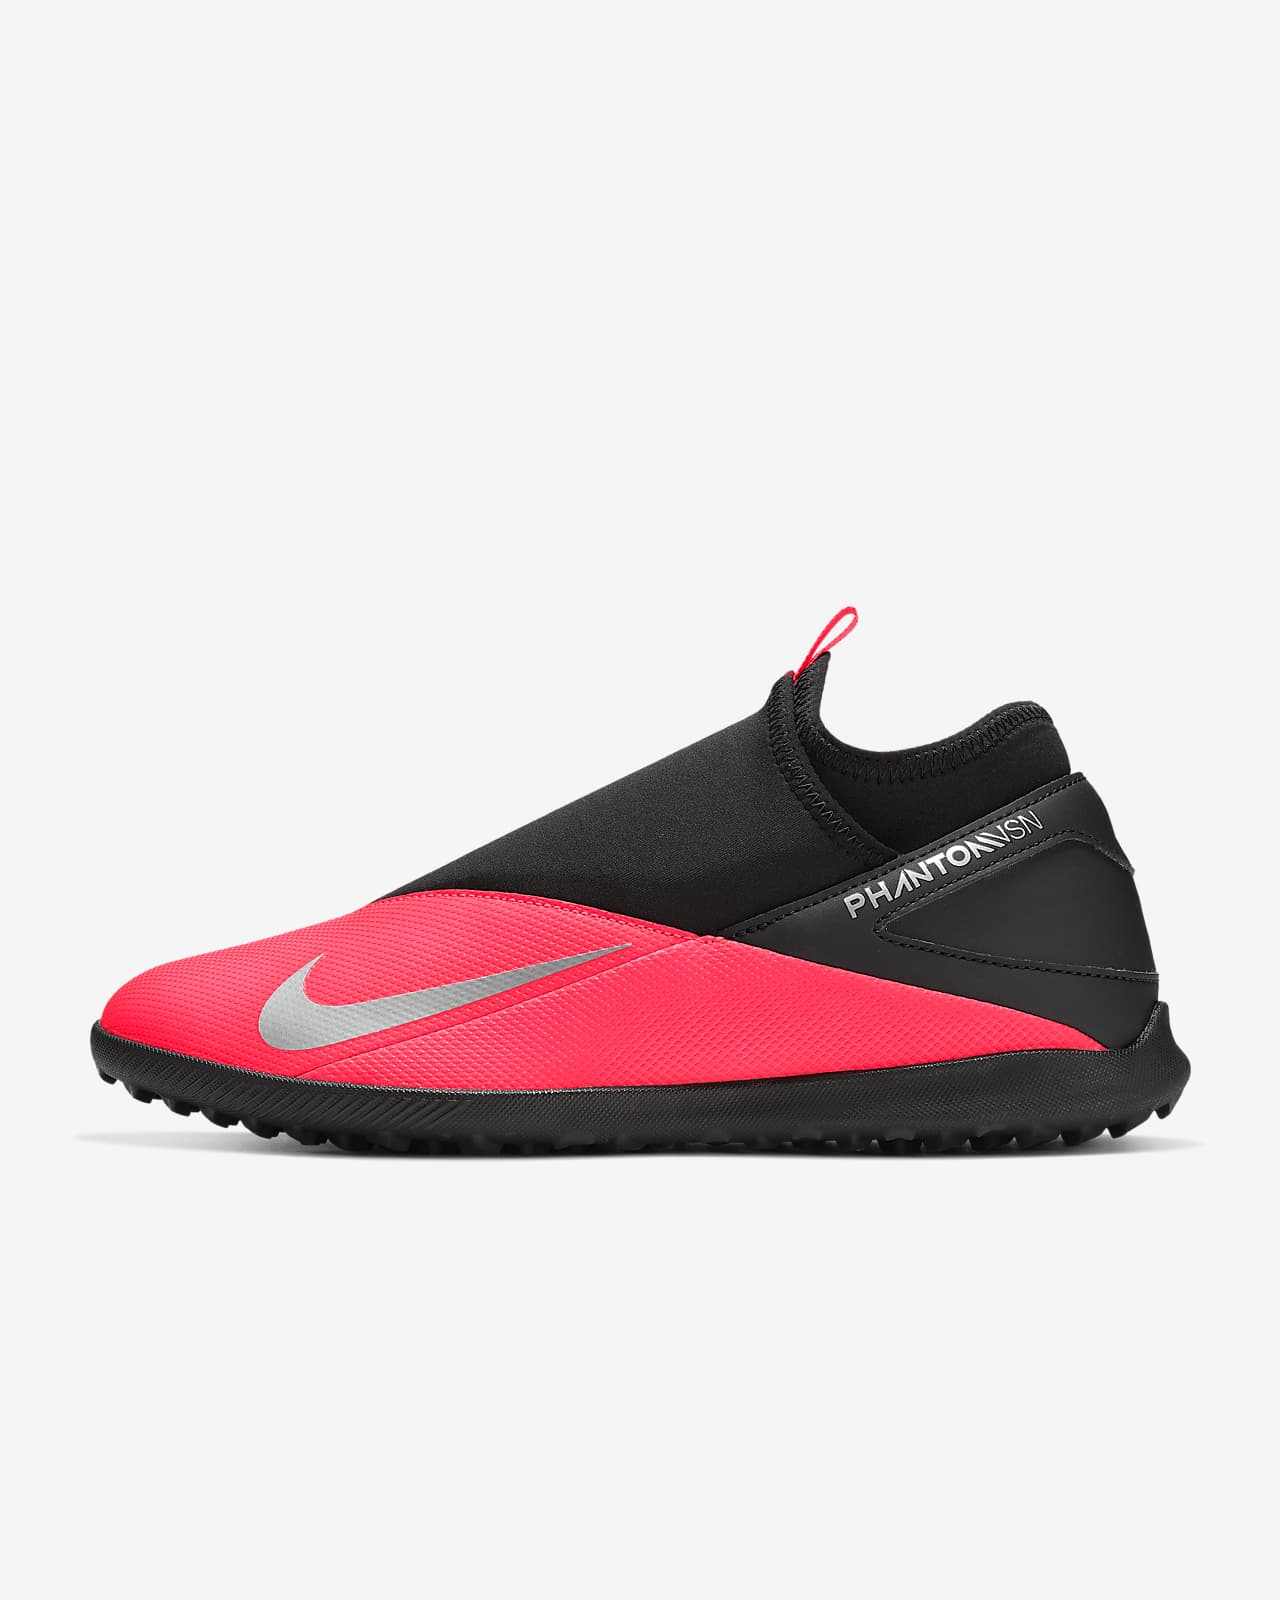 Nike Phantom Vision 2 Club Dynamic Fit